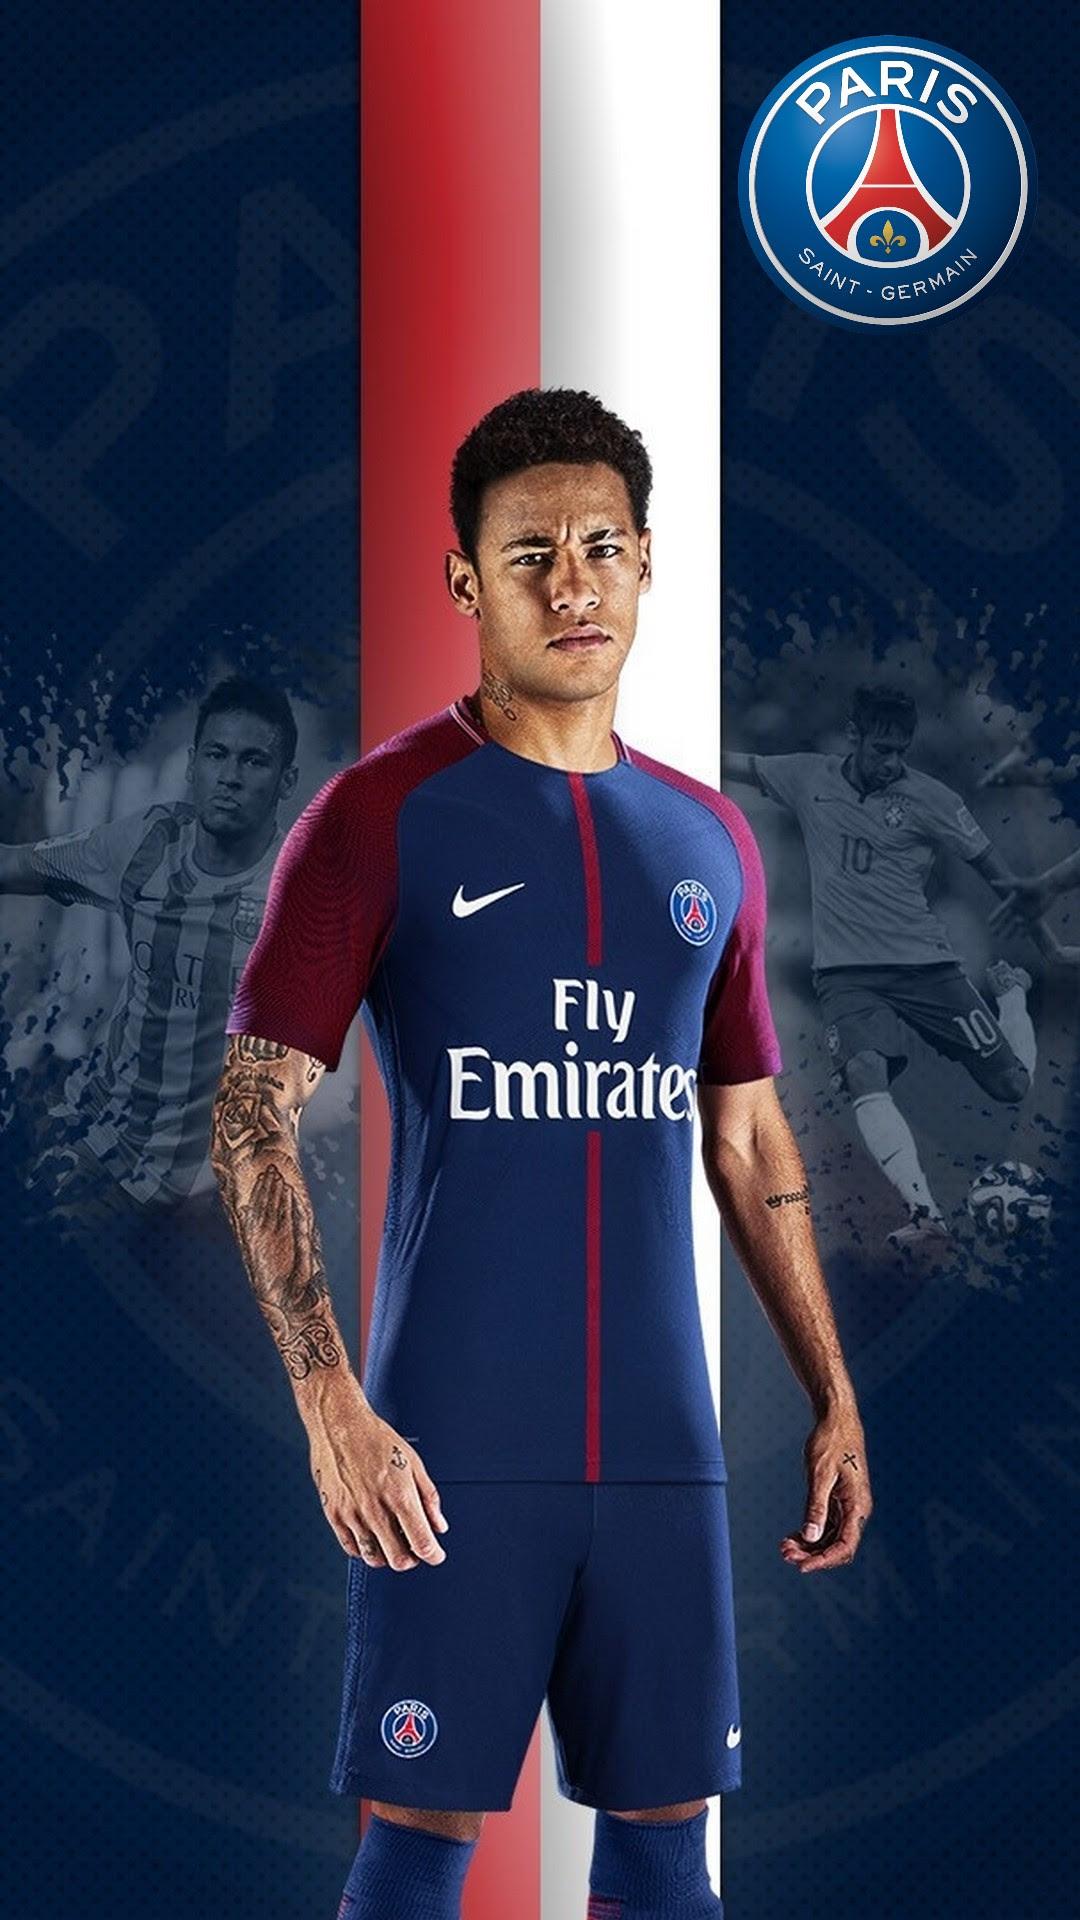 Neymar PSG iPhone Wallpapers | 2019 Football Wallpaper